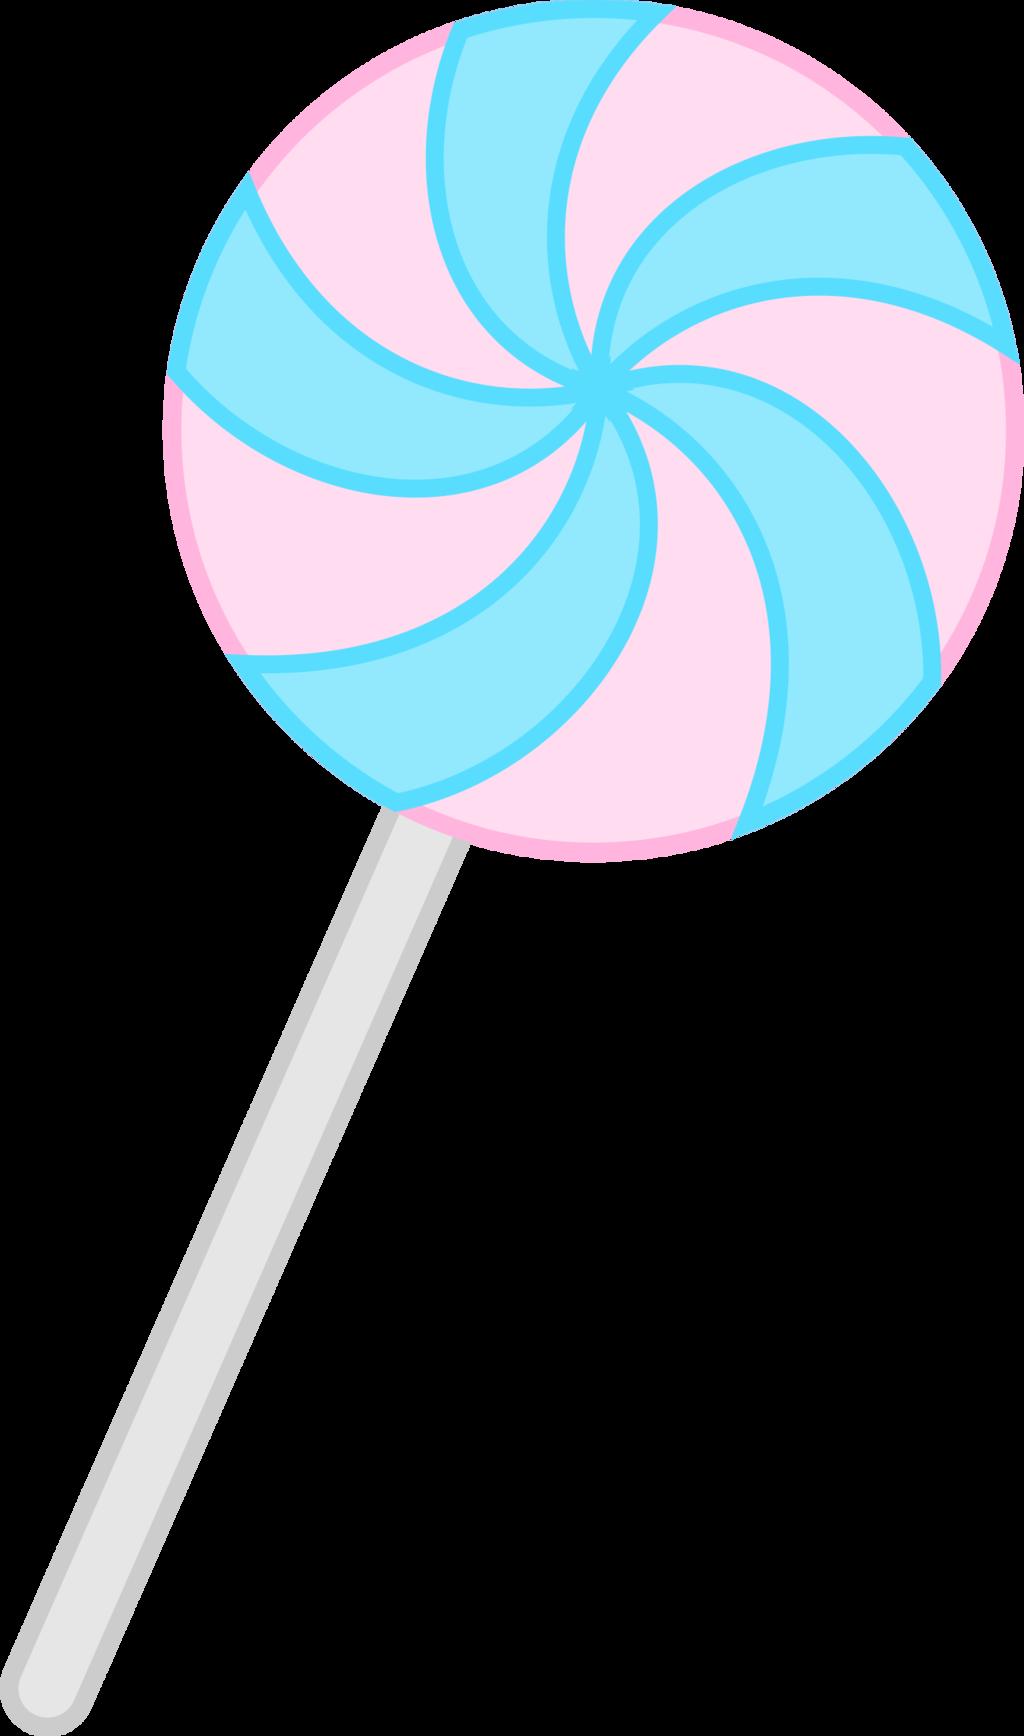 Lolipop oc mix by. Lollipop clipart cutie mark